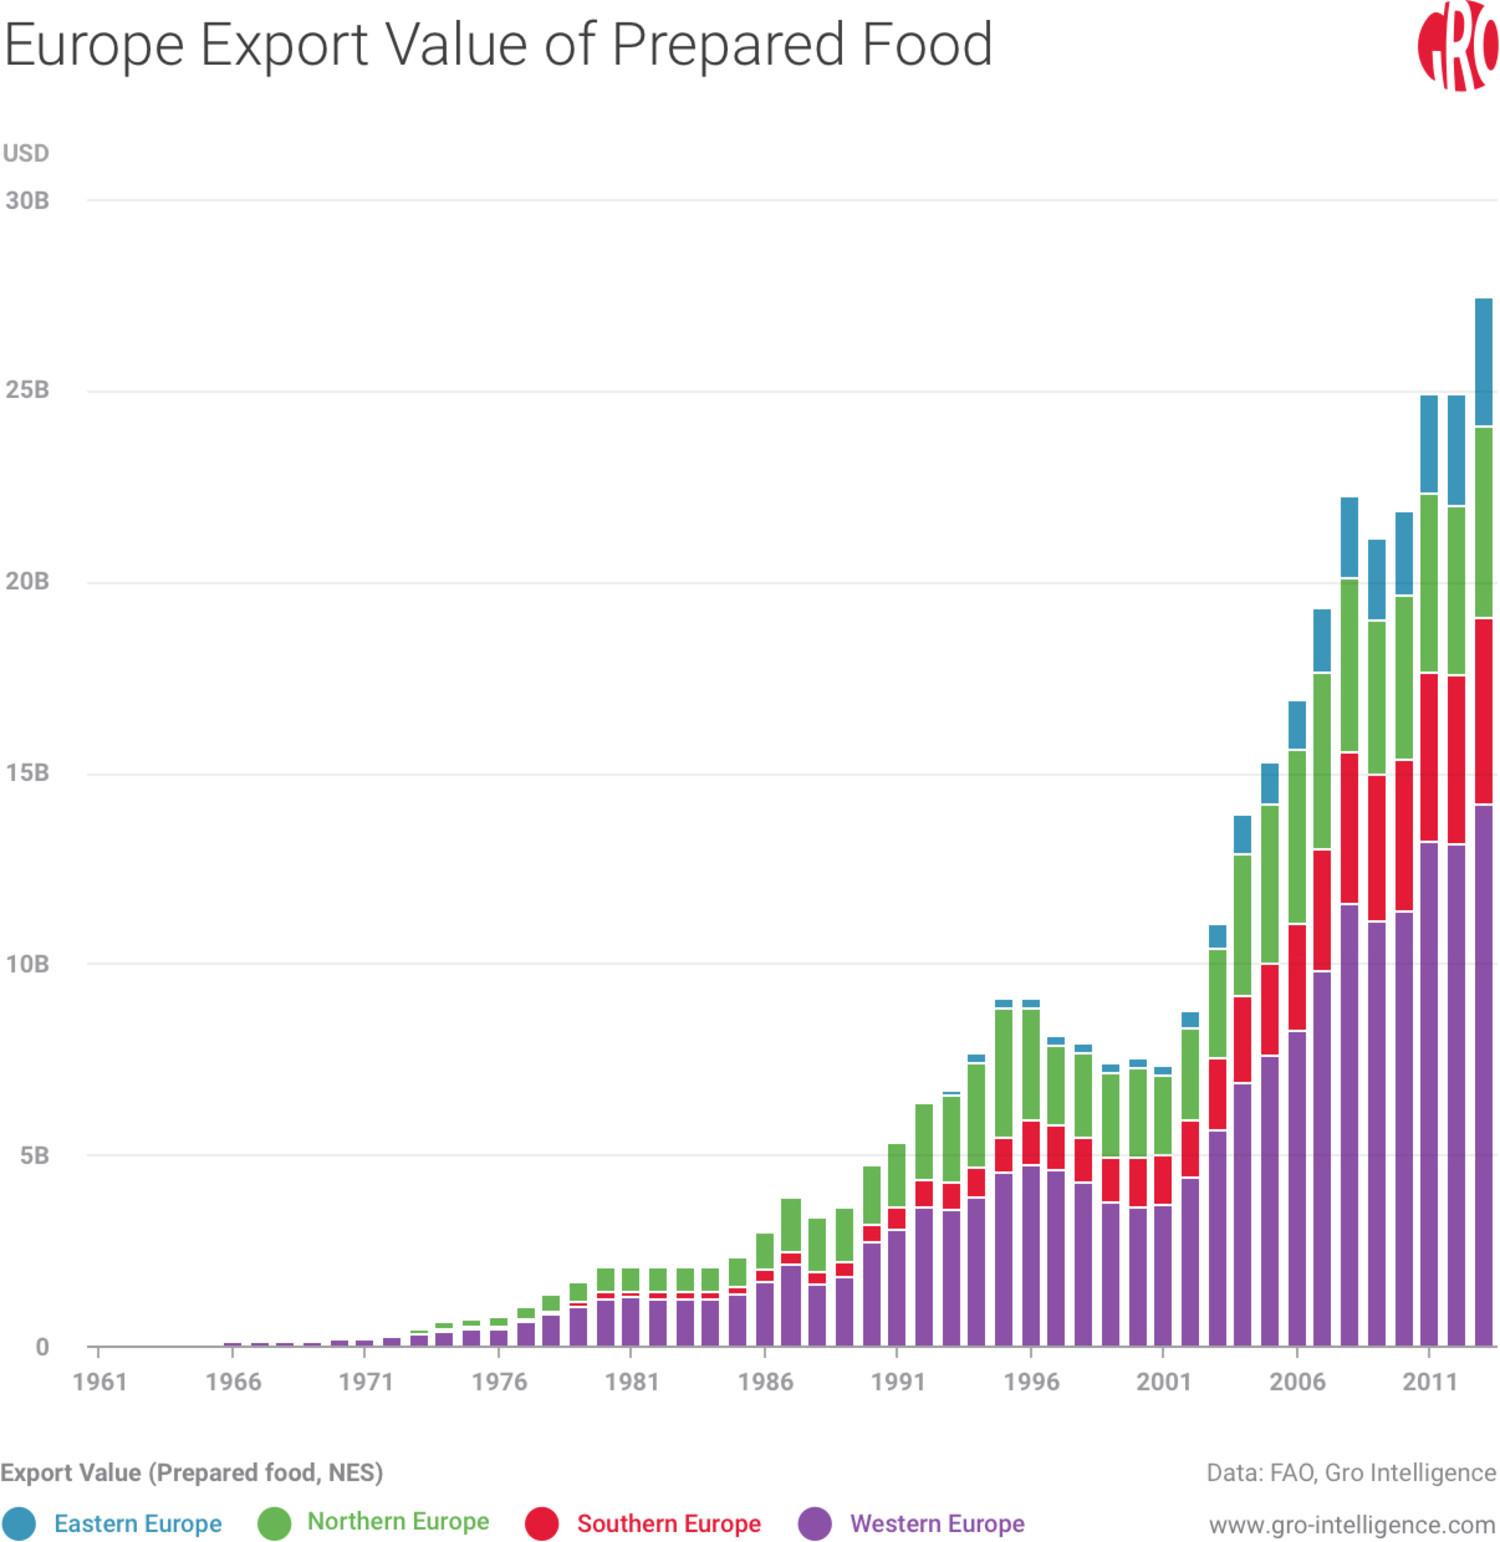 Europe Export Value of Prepared Foods